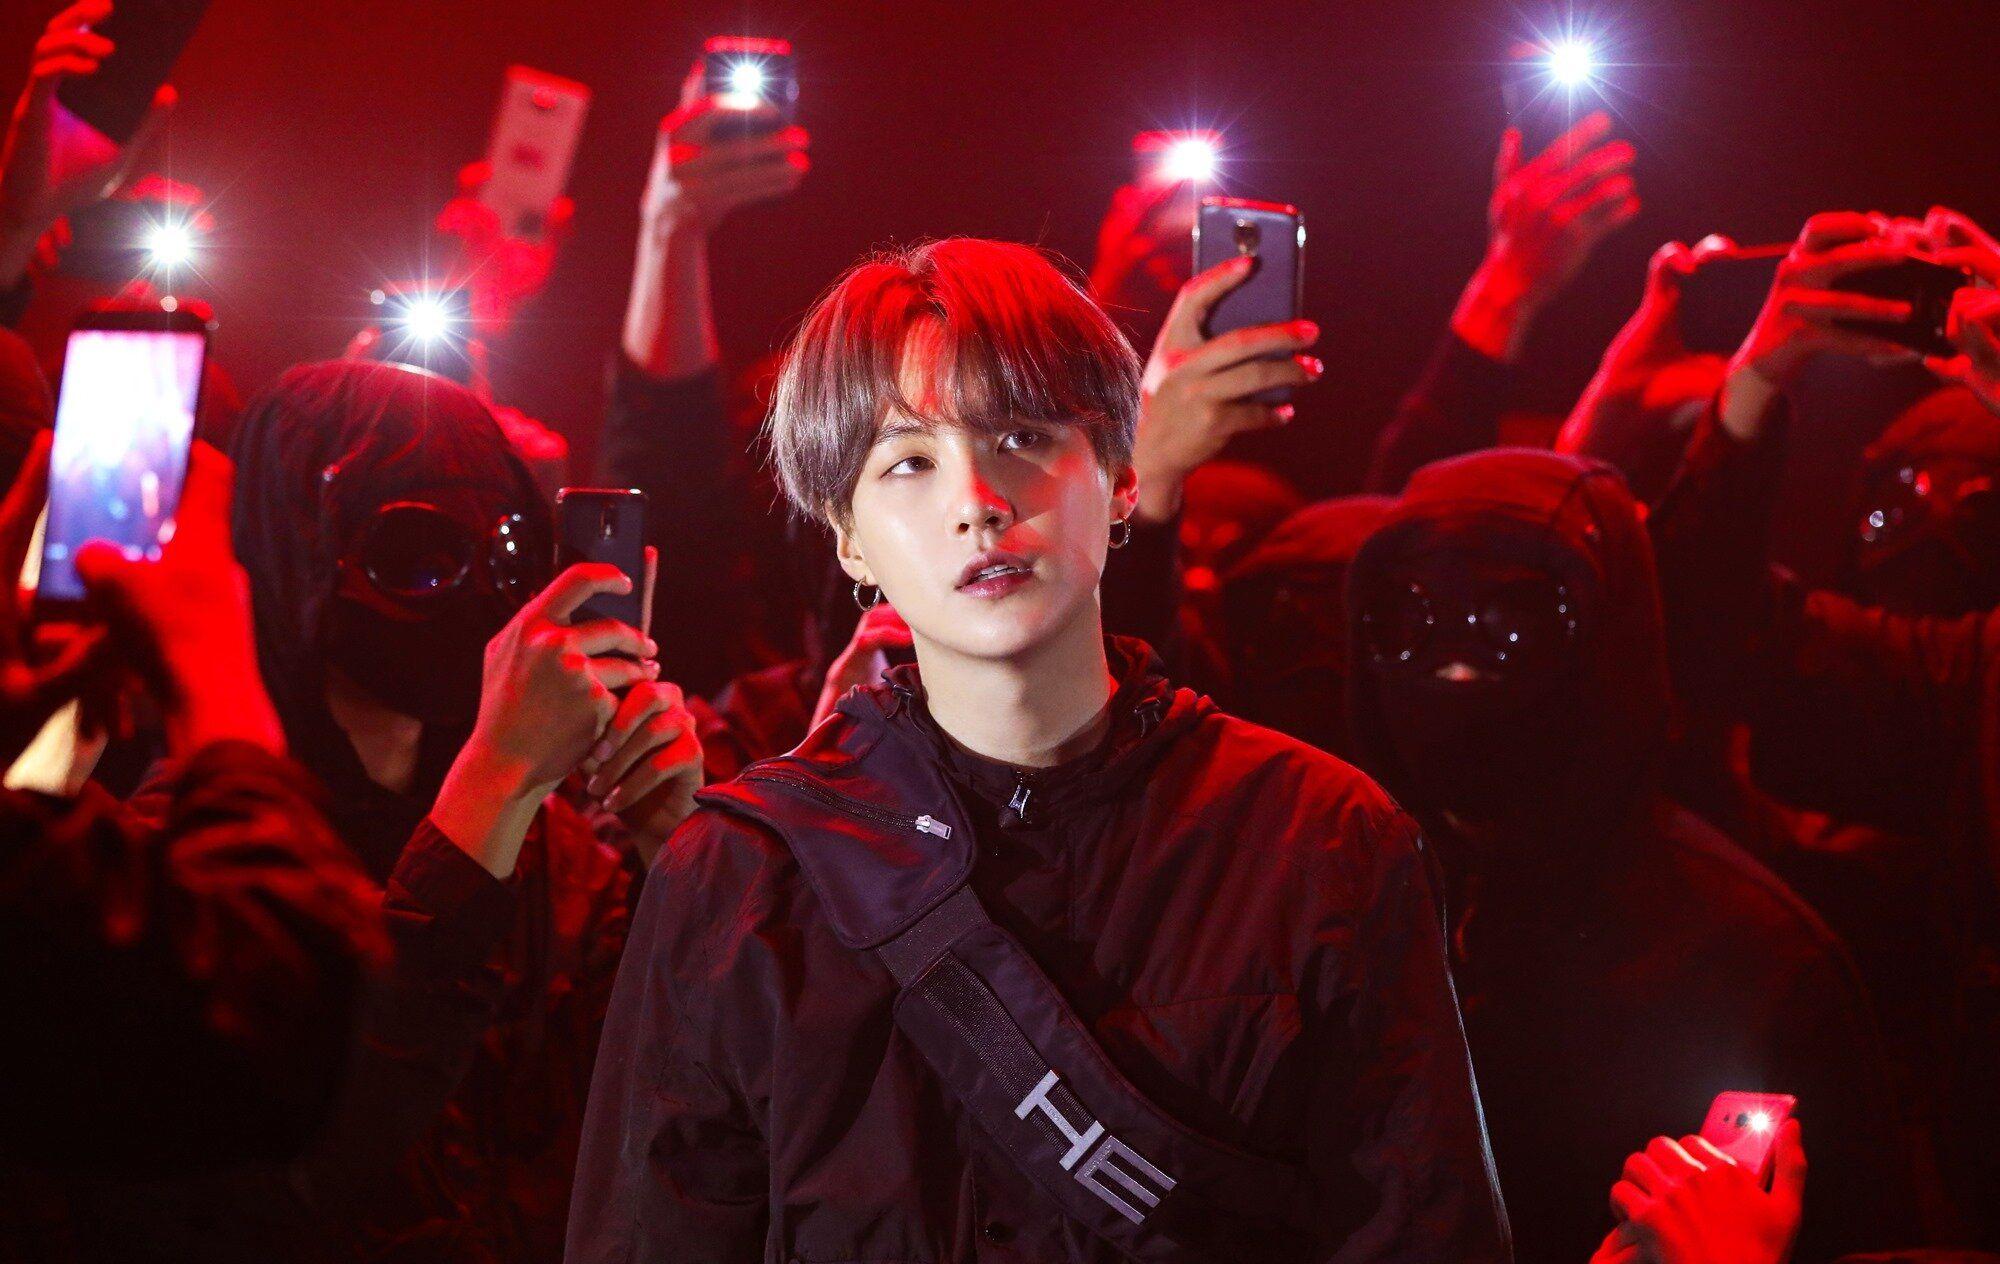 BTS Suga: The K-Pop Rapper's Best Fashion Looks